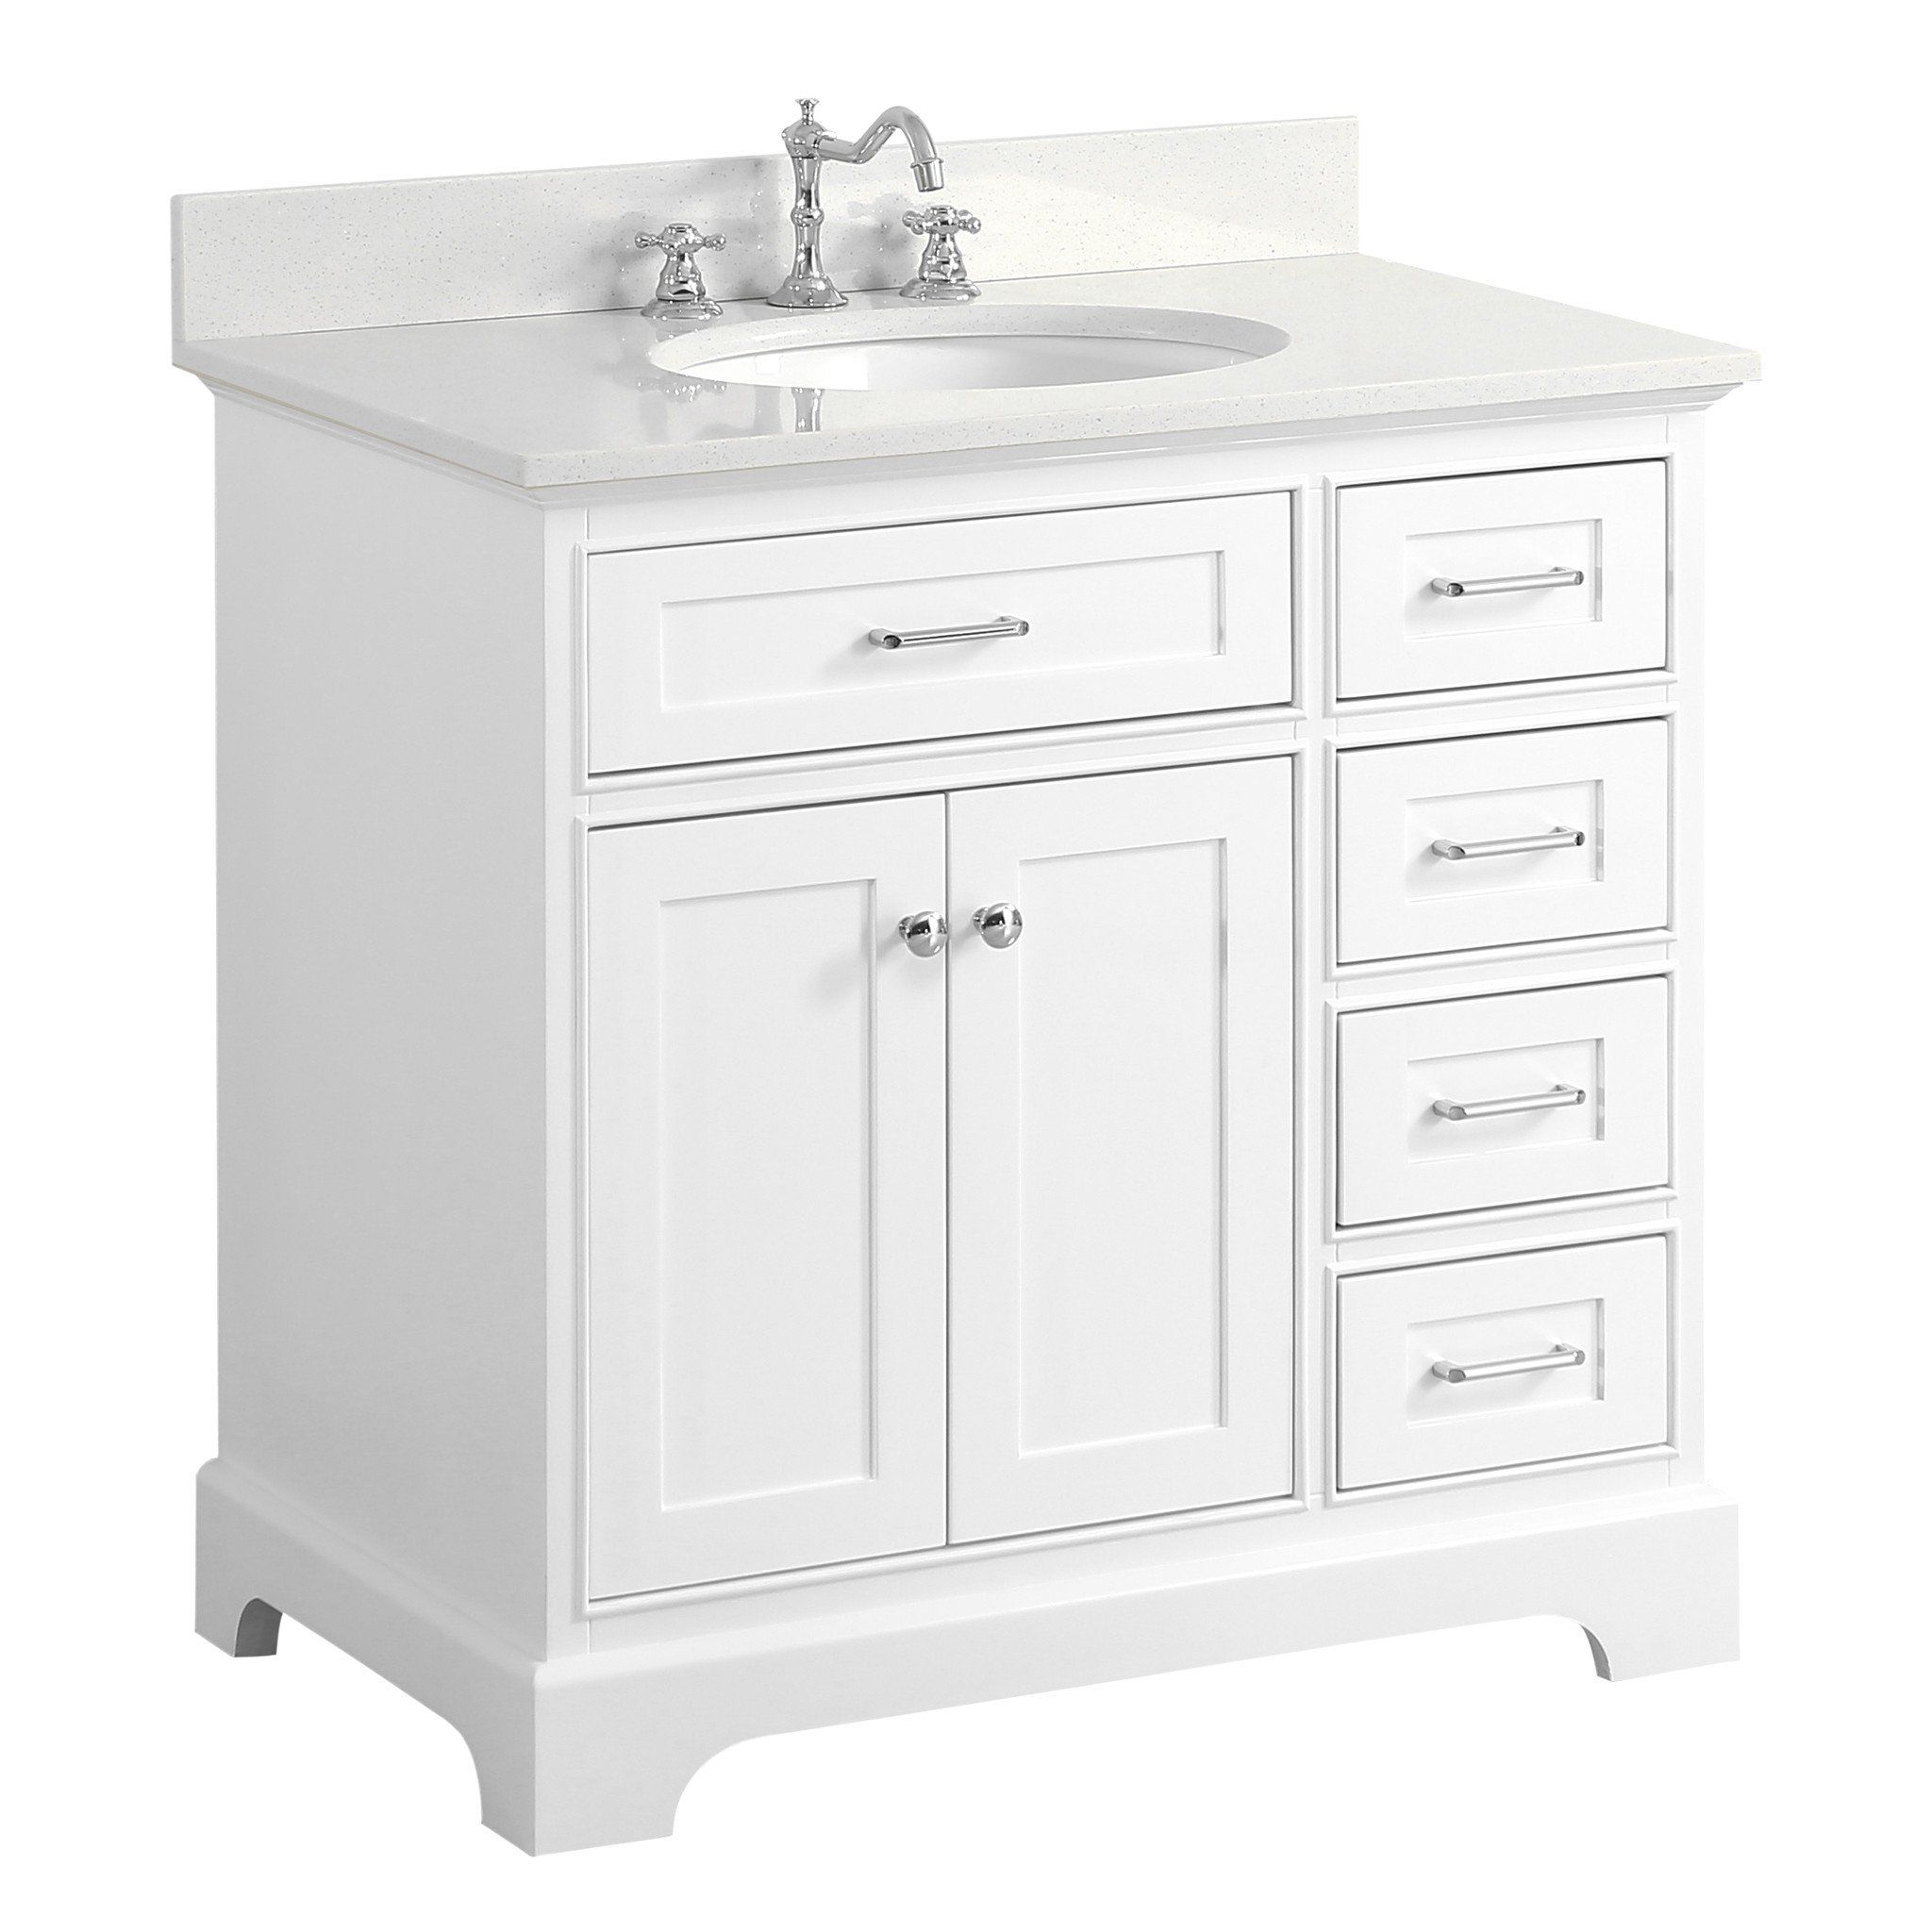 Aria 36 Inch Vanity Quartz White Kitchenbathcollection